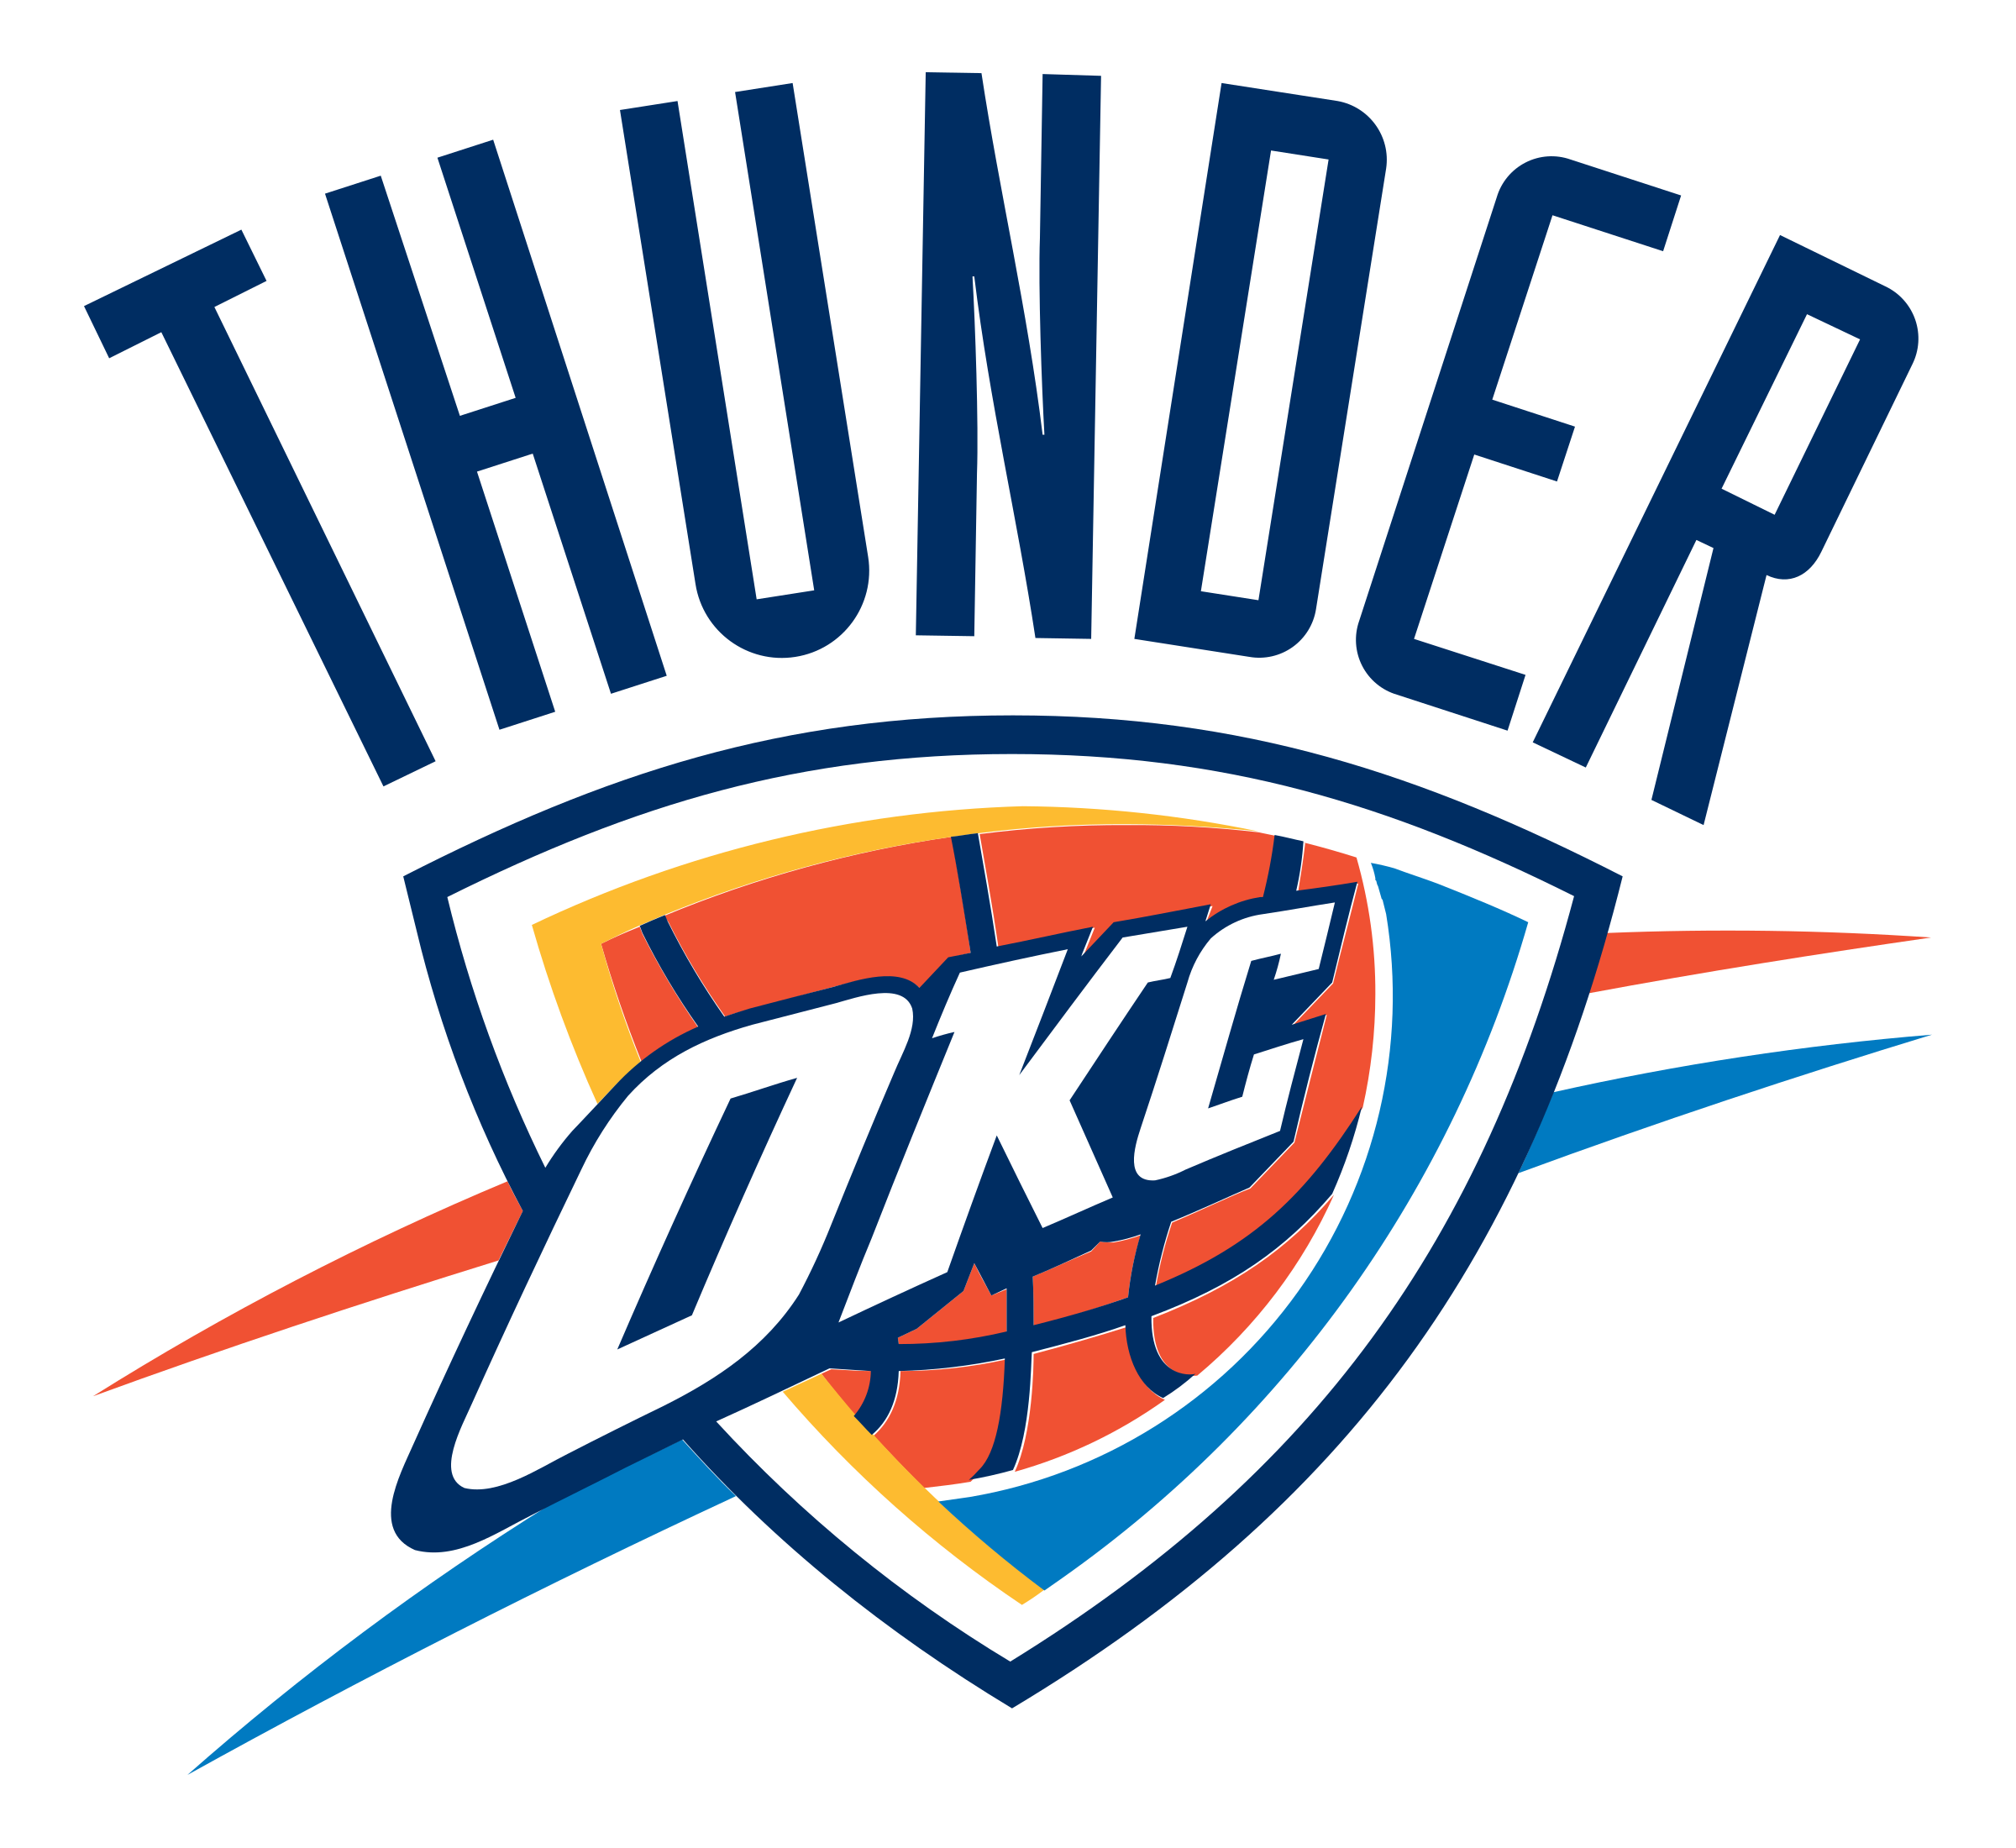 oklahoma-city-thunder-logo-transparent.png